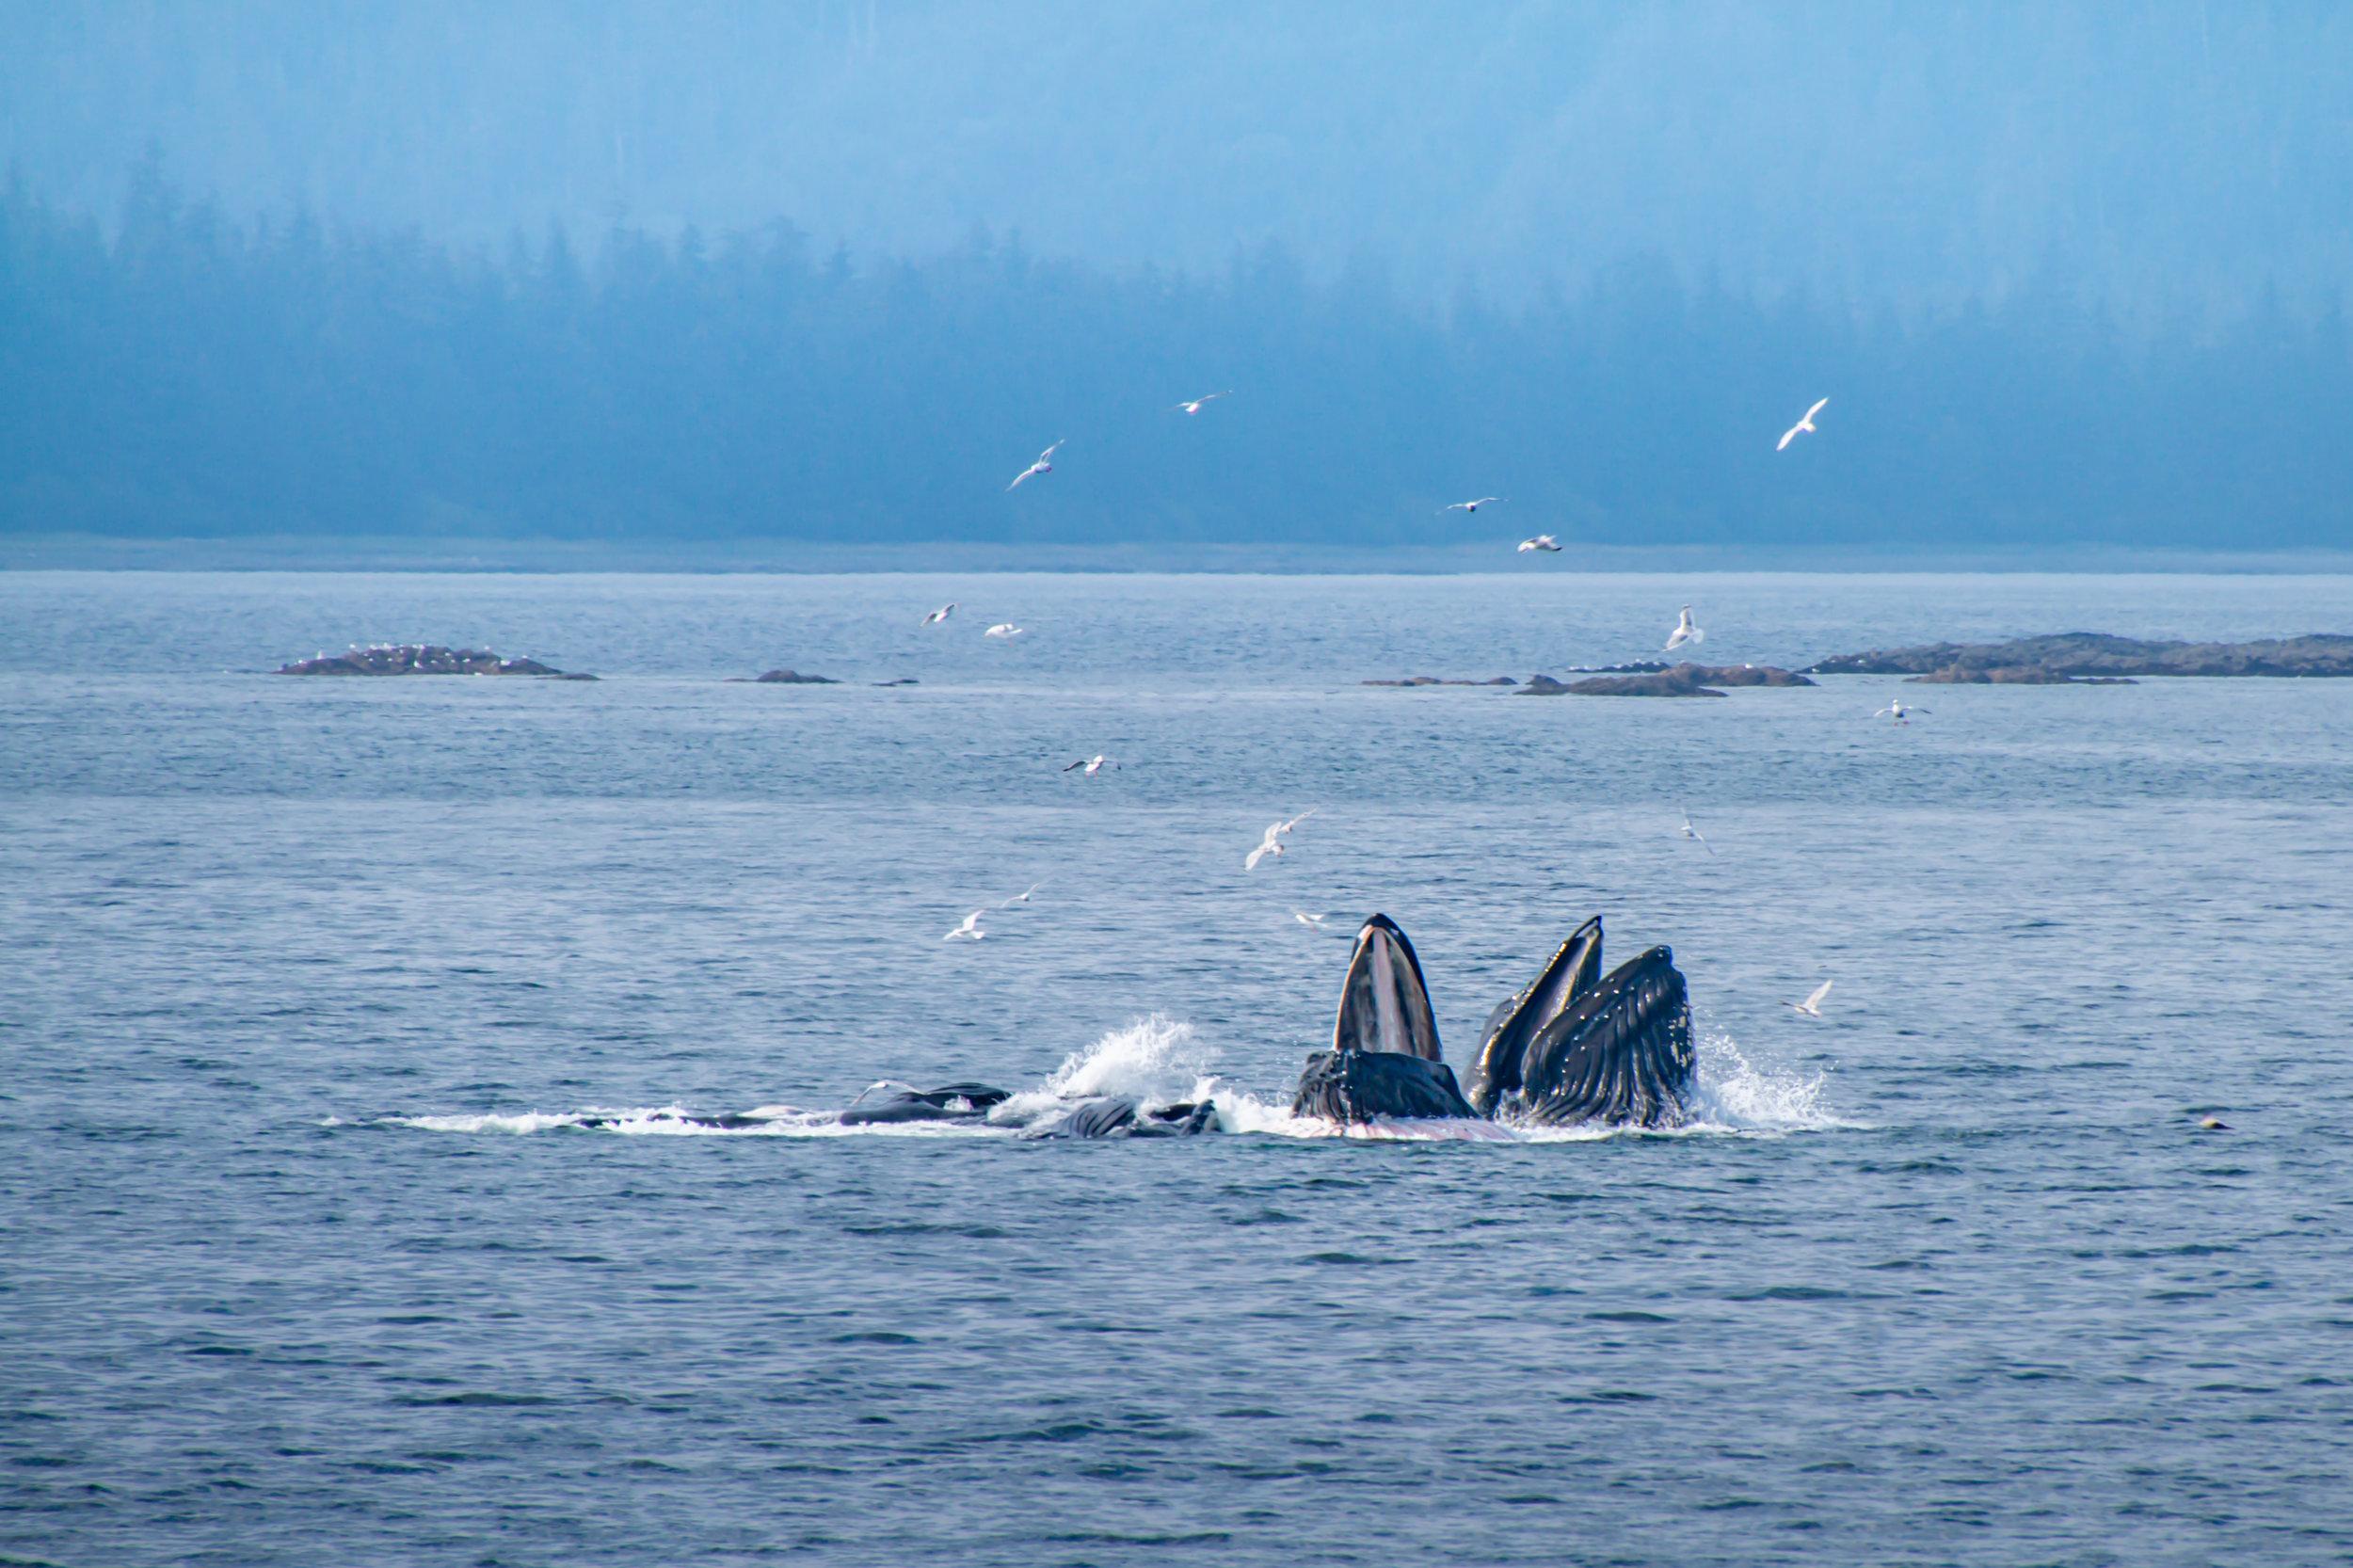 Humpback Whales bubble-net feeding in Chatham Strait, Southeast Alaska.